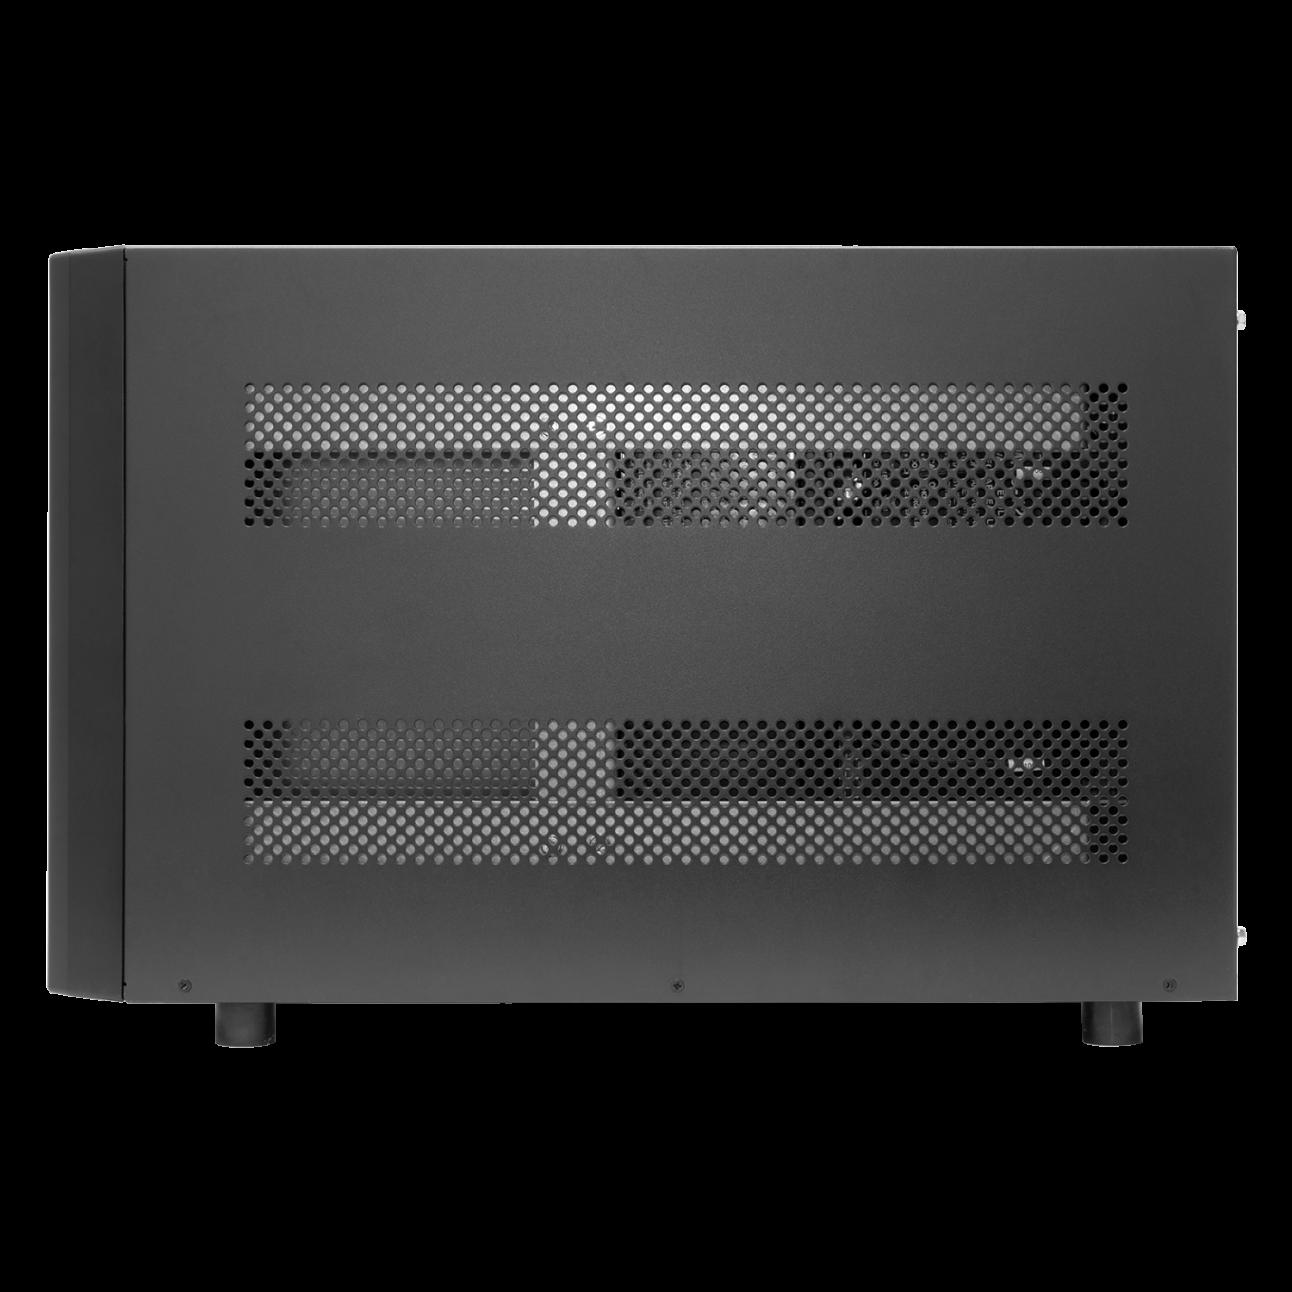 Блок батарей  для ИБП серии BASE, 192 VDC 9 Ач